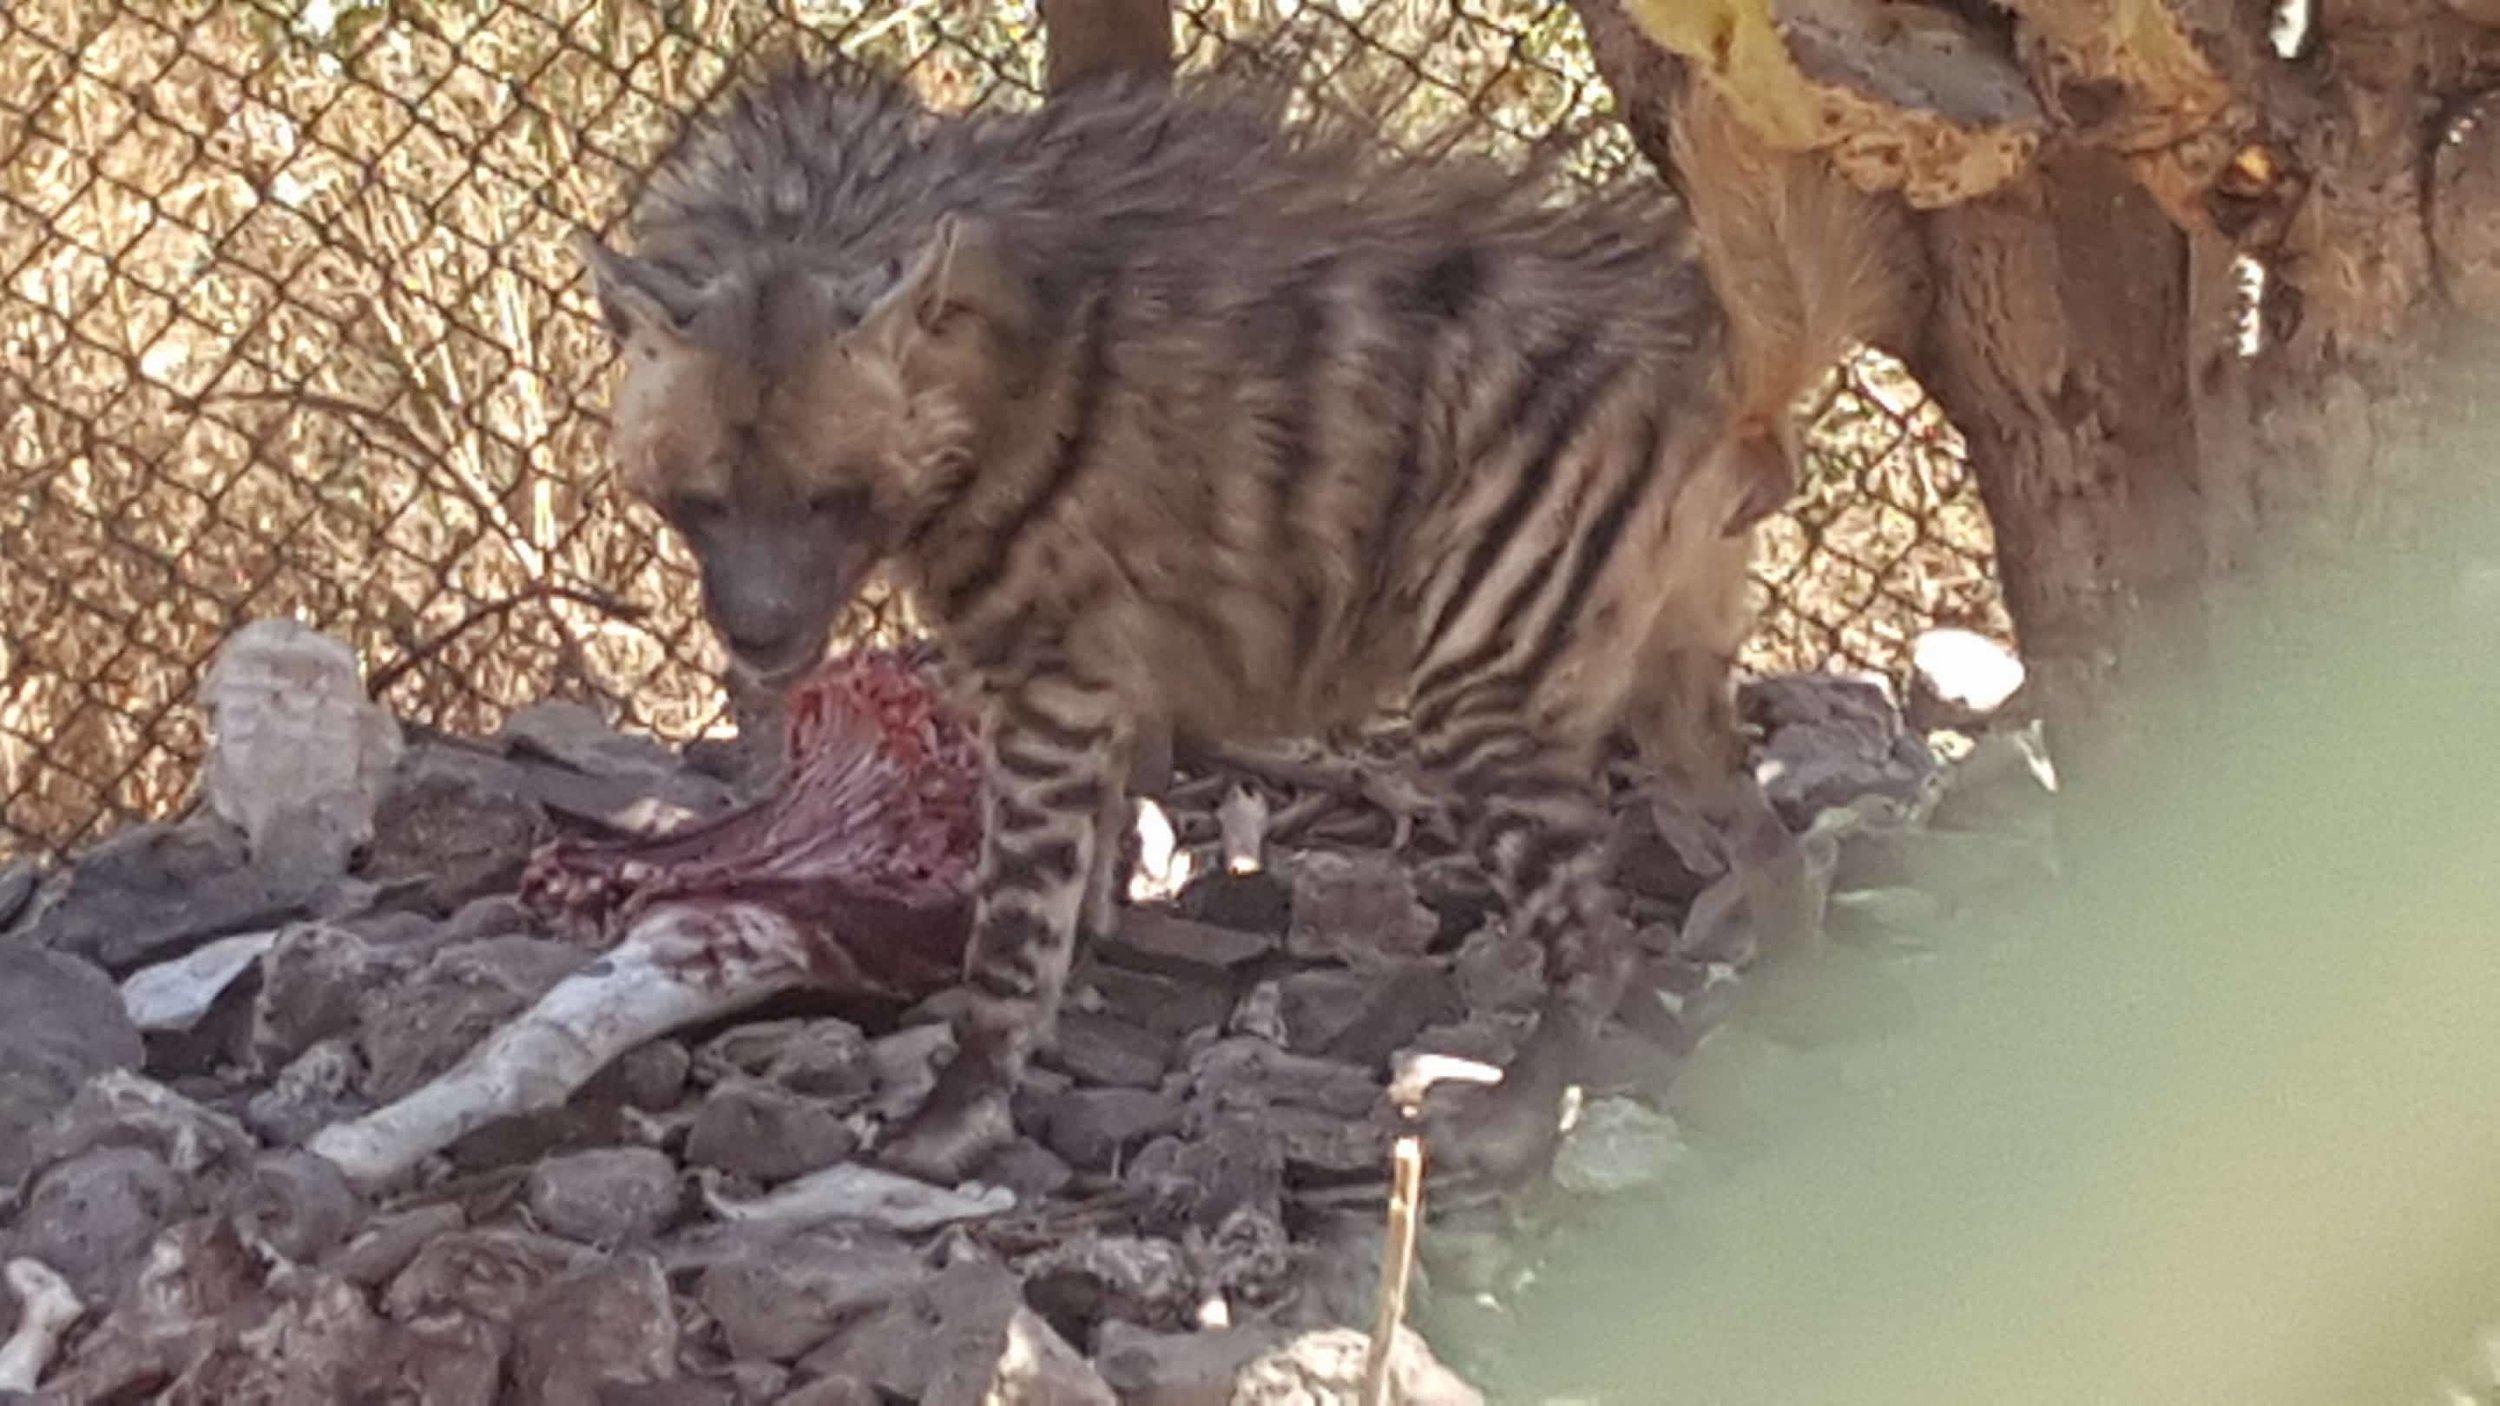 IBB ZOO hyena so hungry OWAPAR Yemen Salman pic 5 jan 201826654734_301234757064171_1594547284_o.jpg